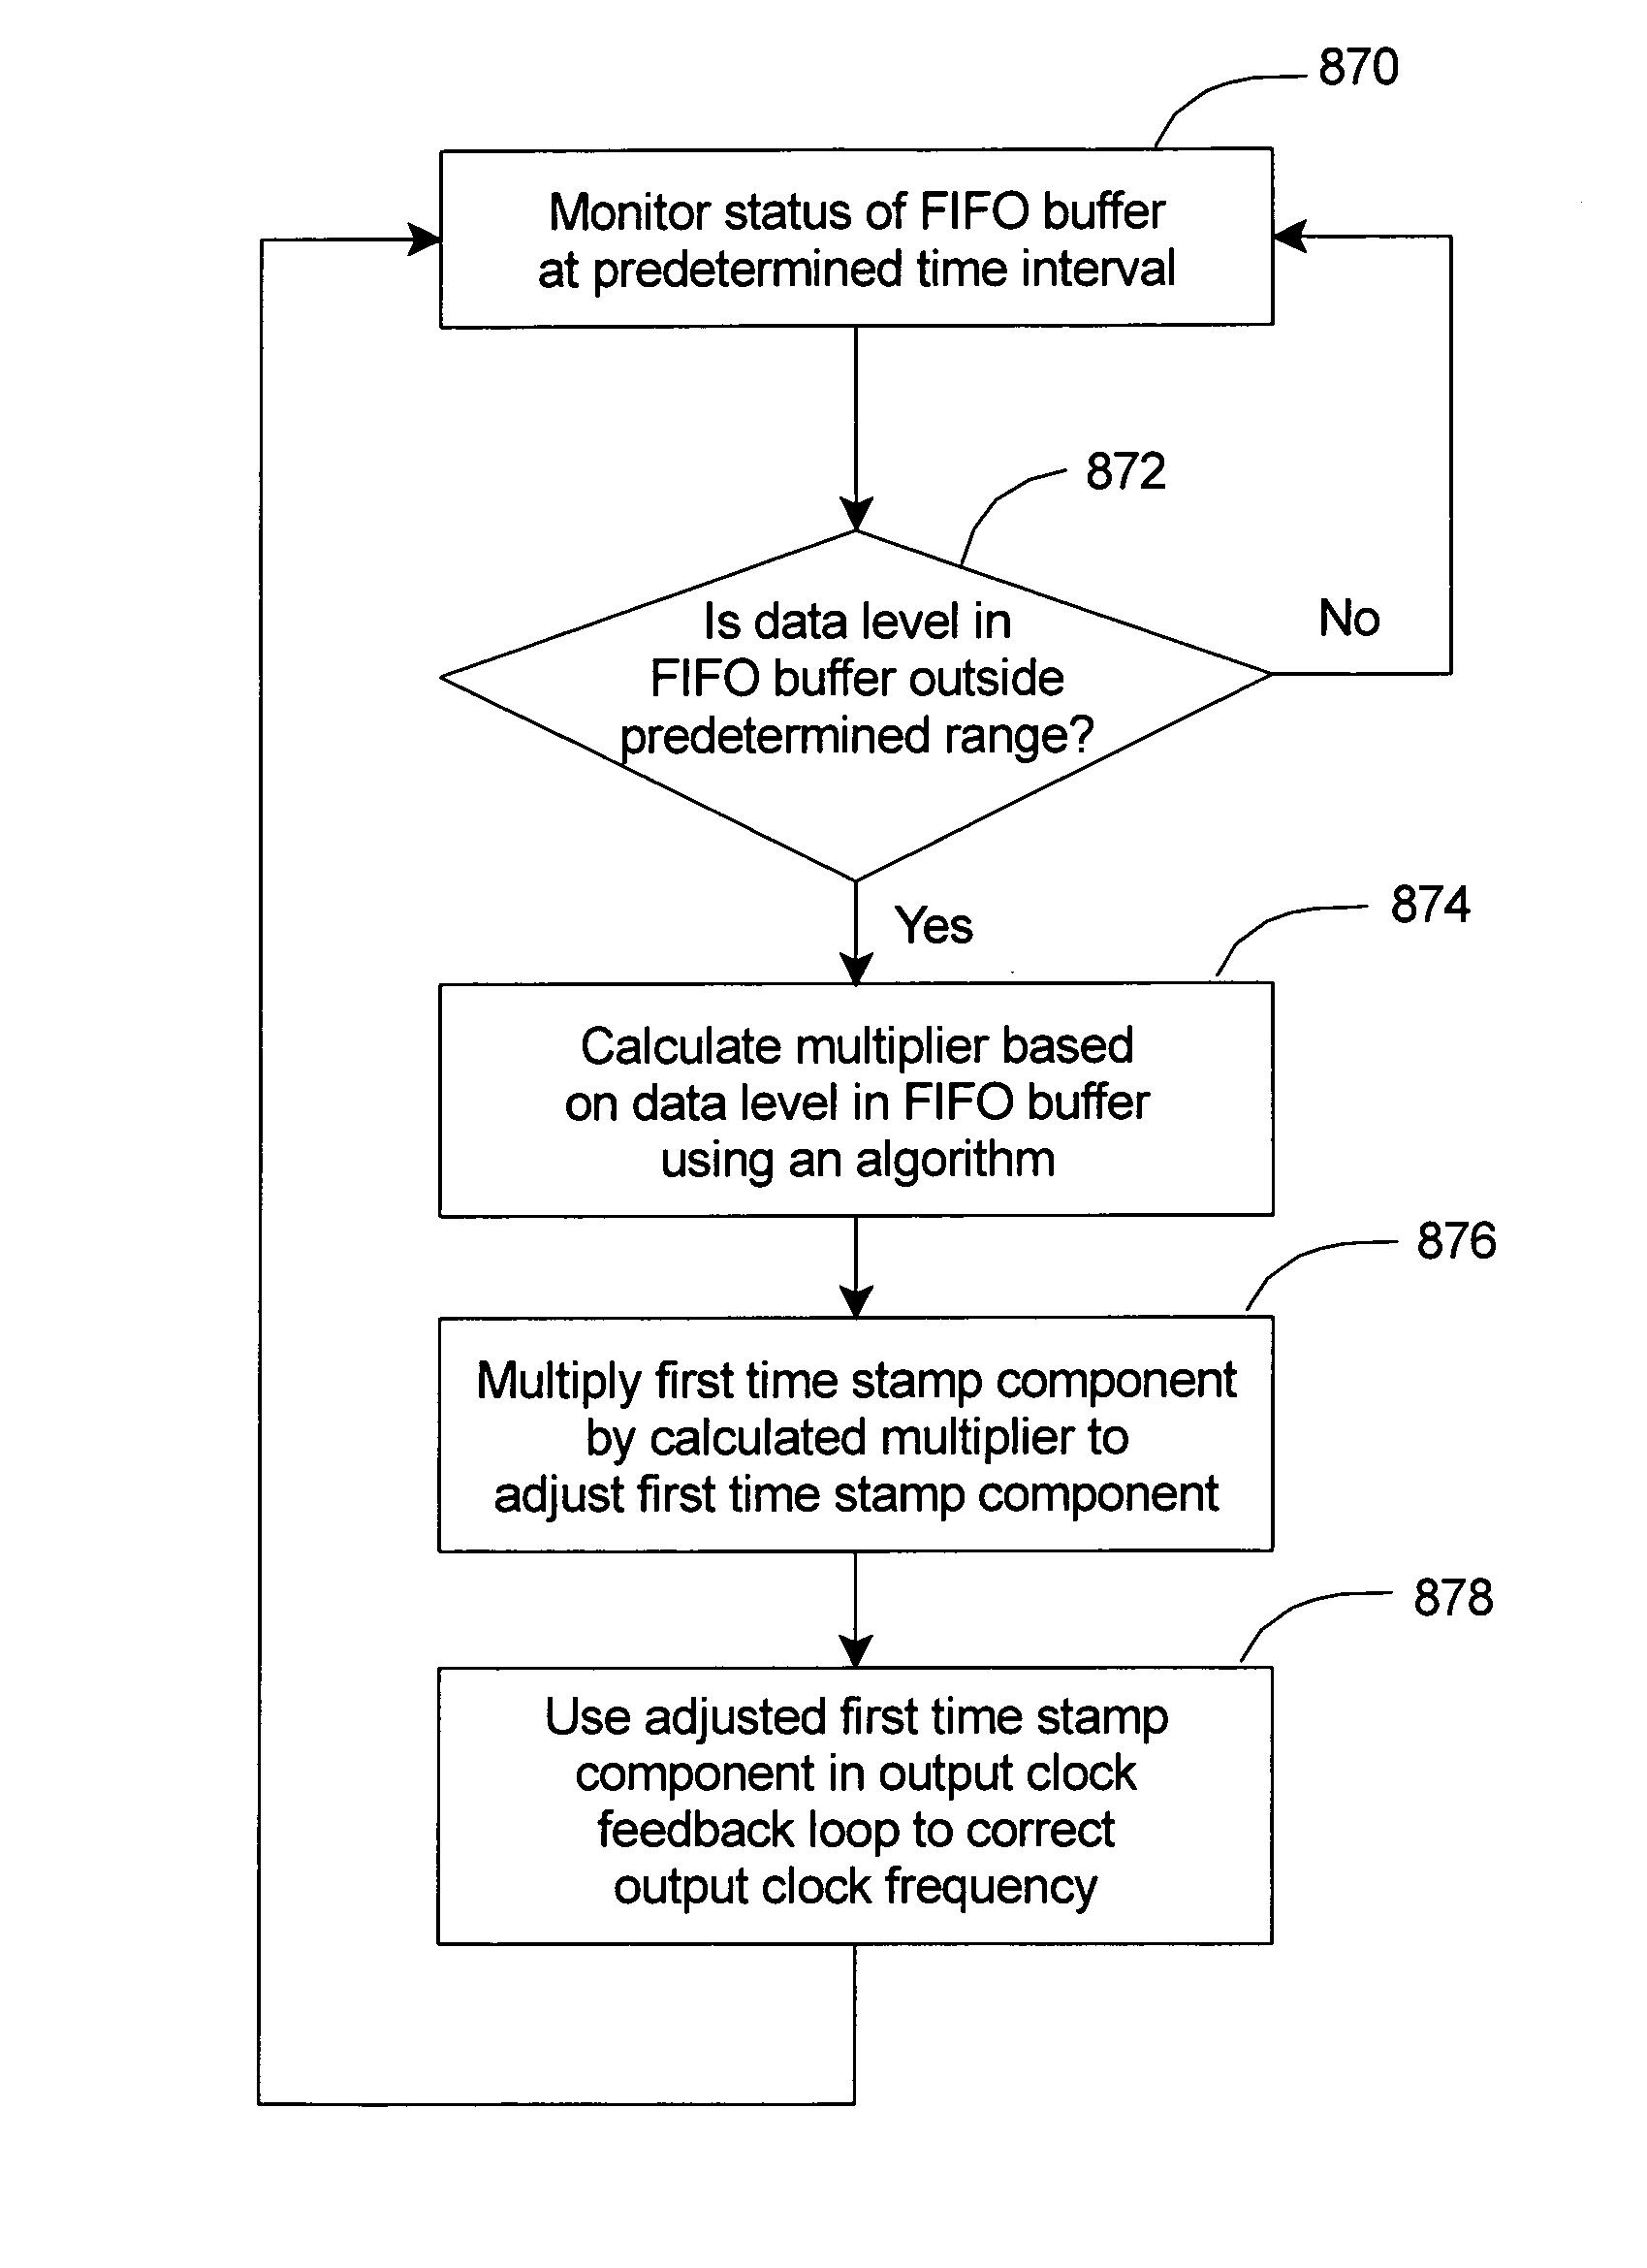 براءة الاختراع US8135105 - Circuit for correcting an output clock